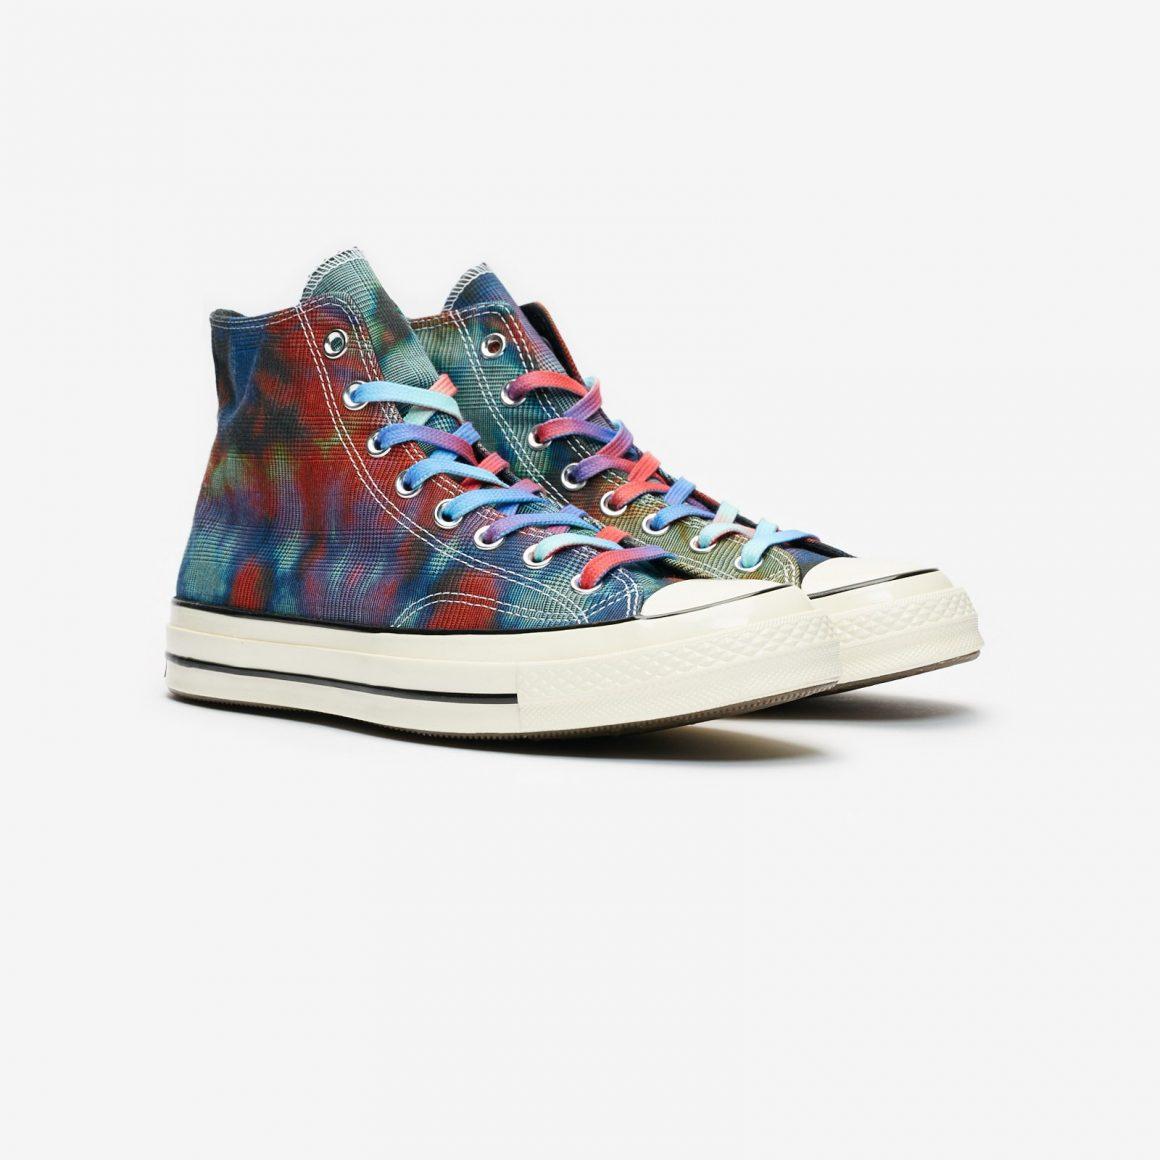 Converse Chuck 70 Hi ''Tie Dye Plaid'' - 168752C